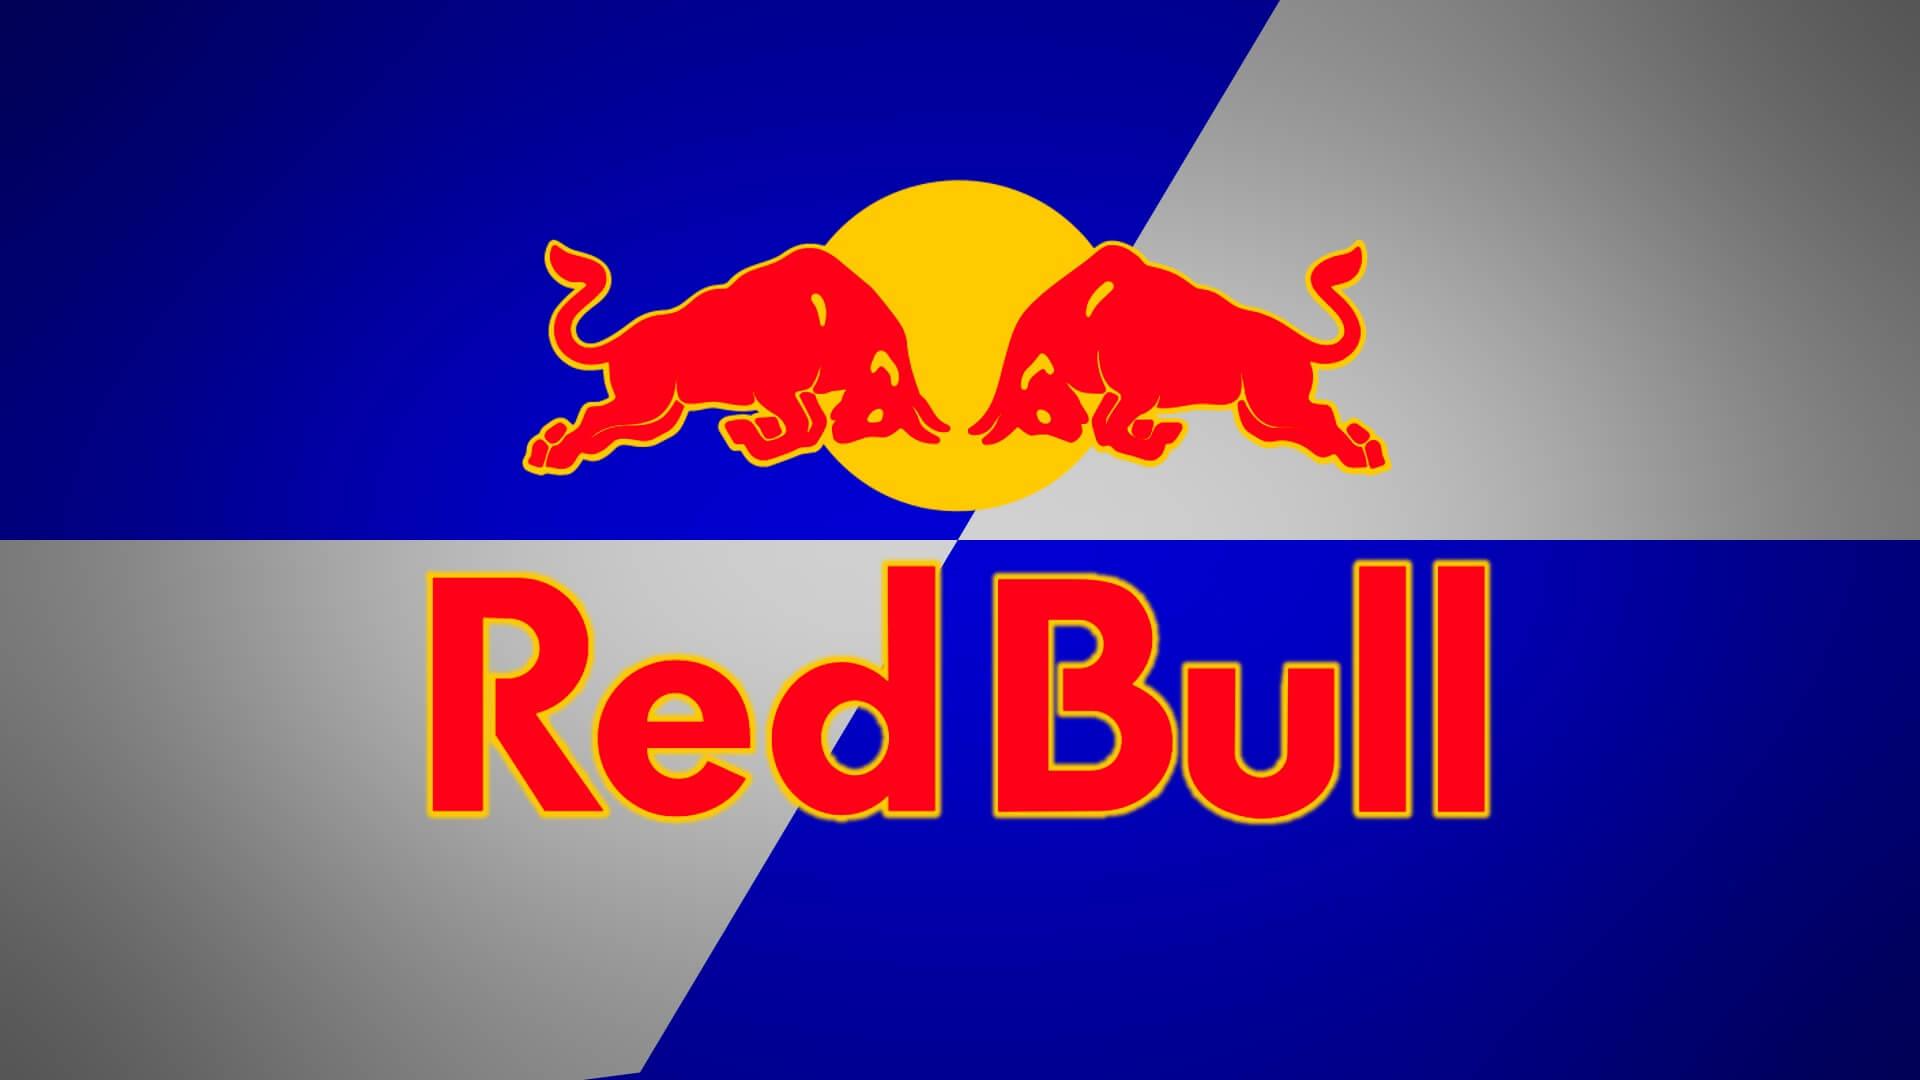 Red Bull Case Study